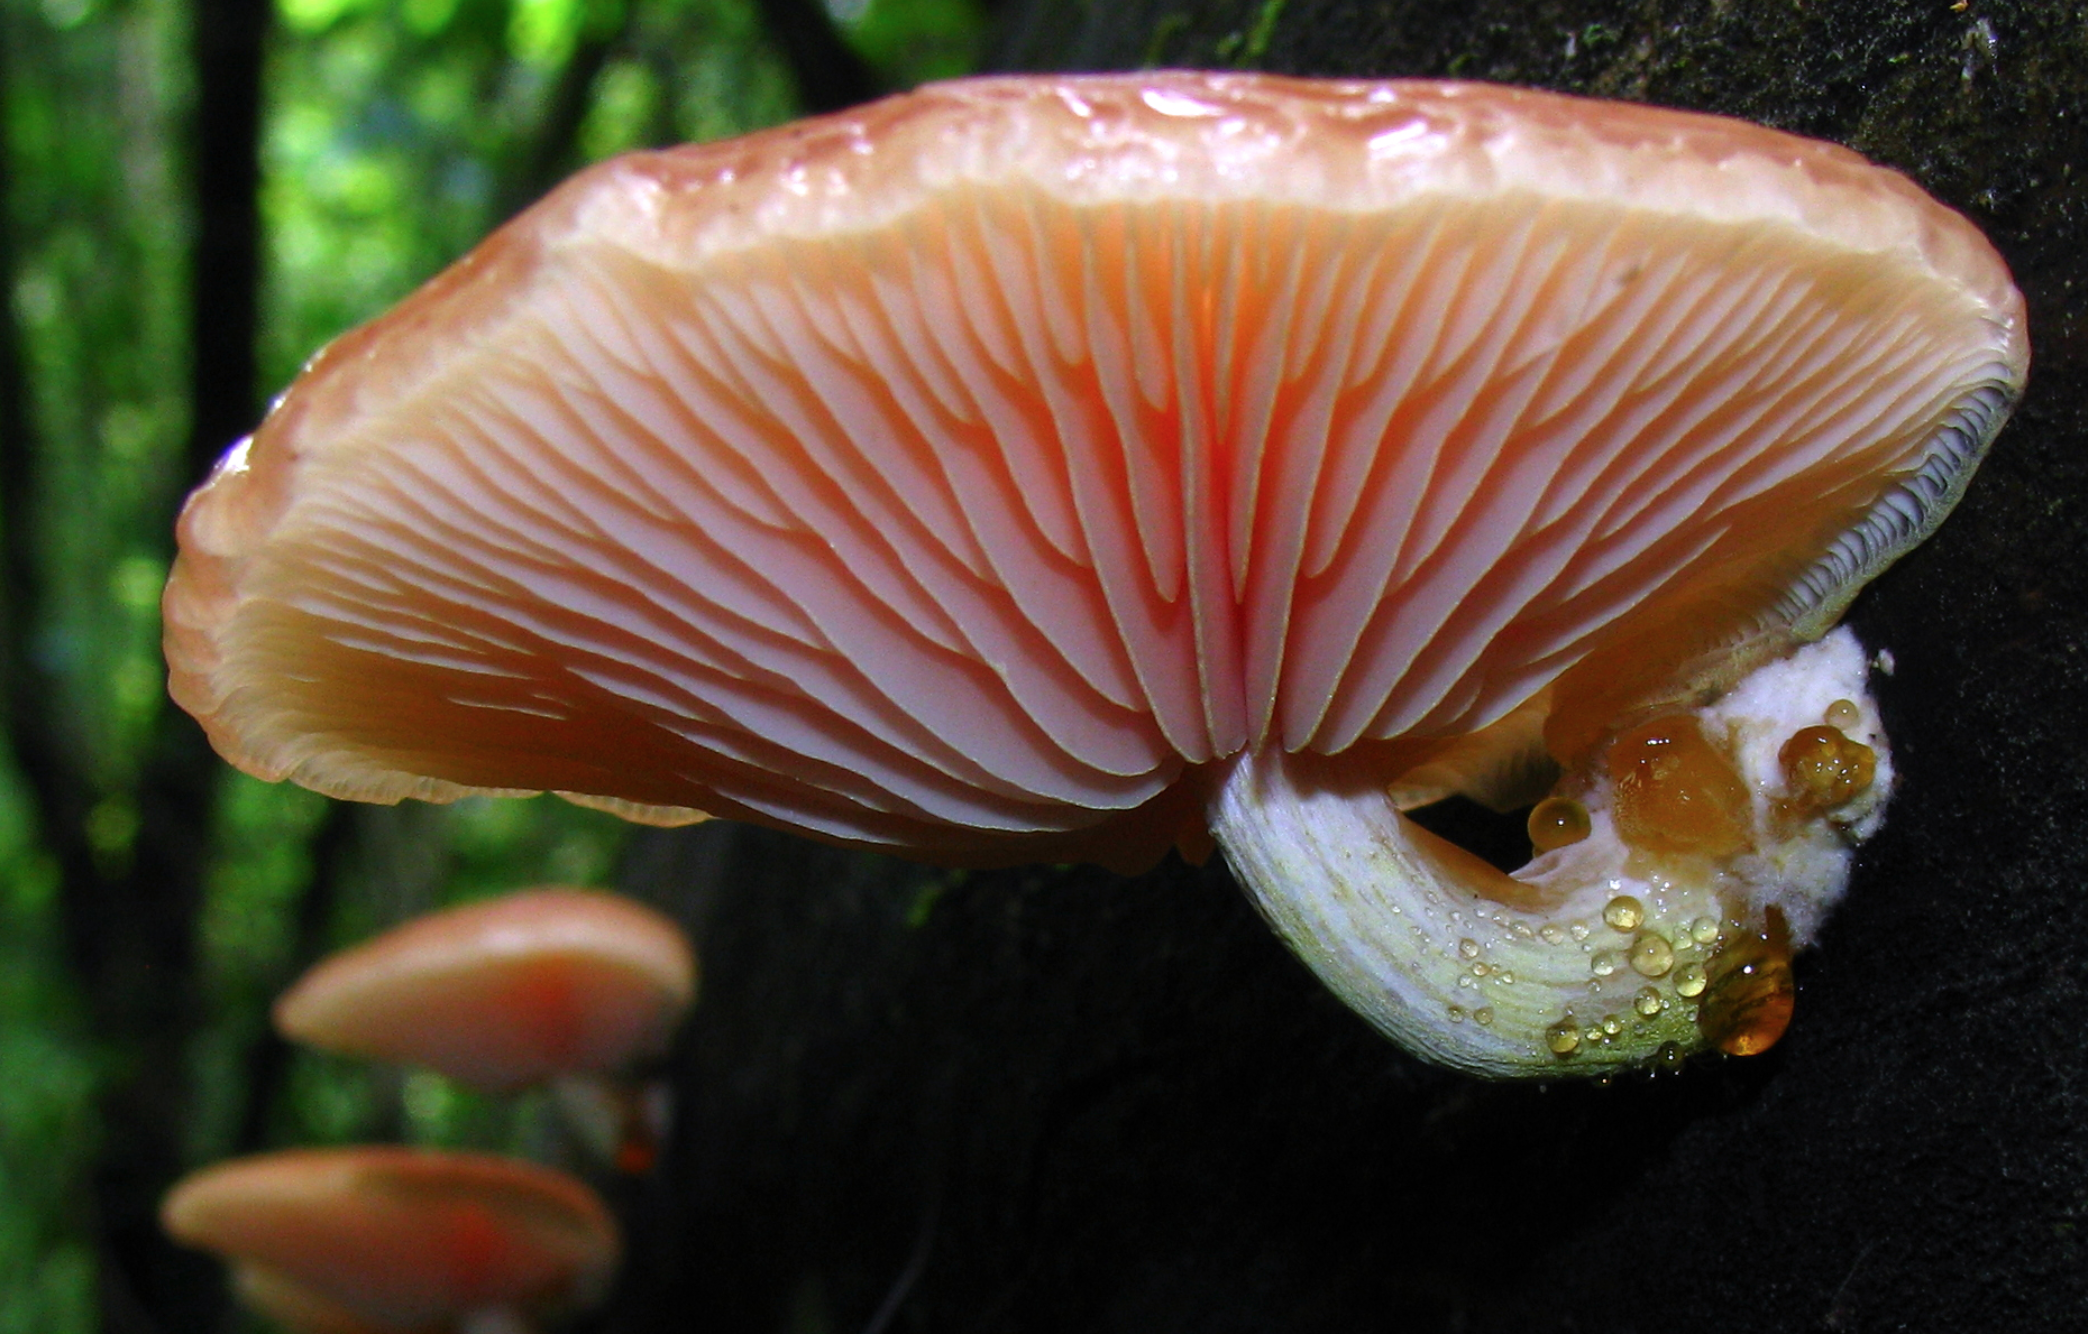 Short gills, called  lamellulae  lie in between full length gills.